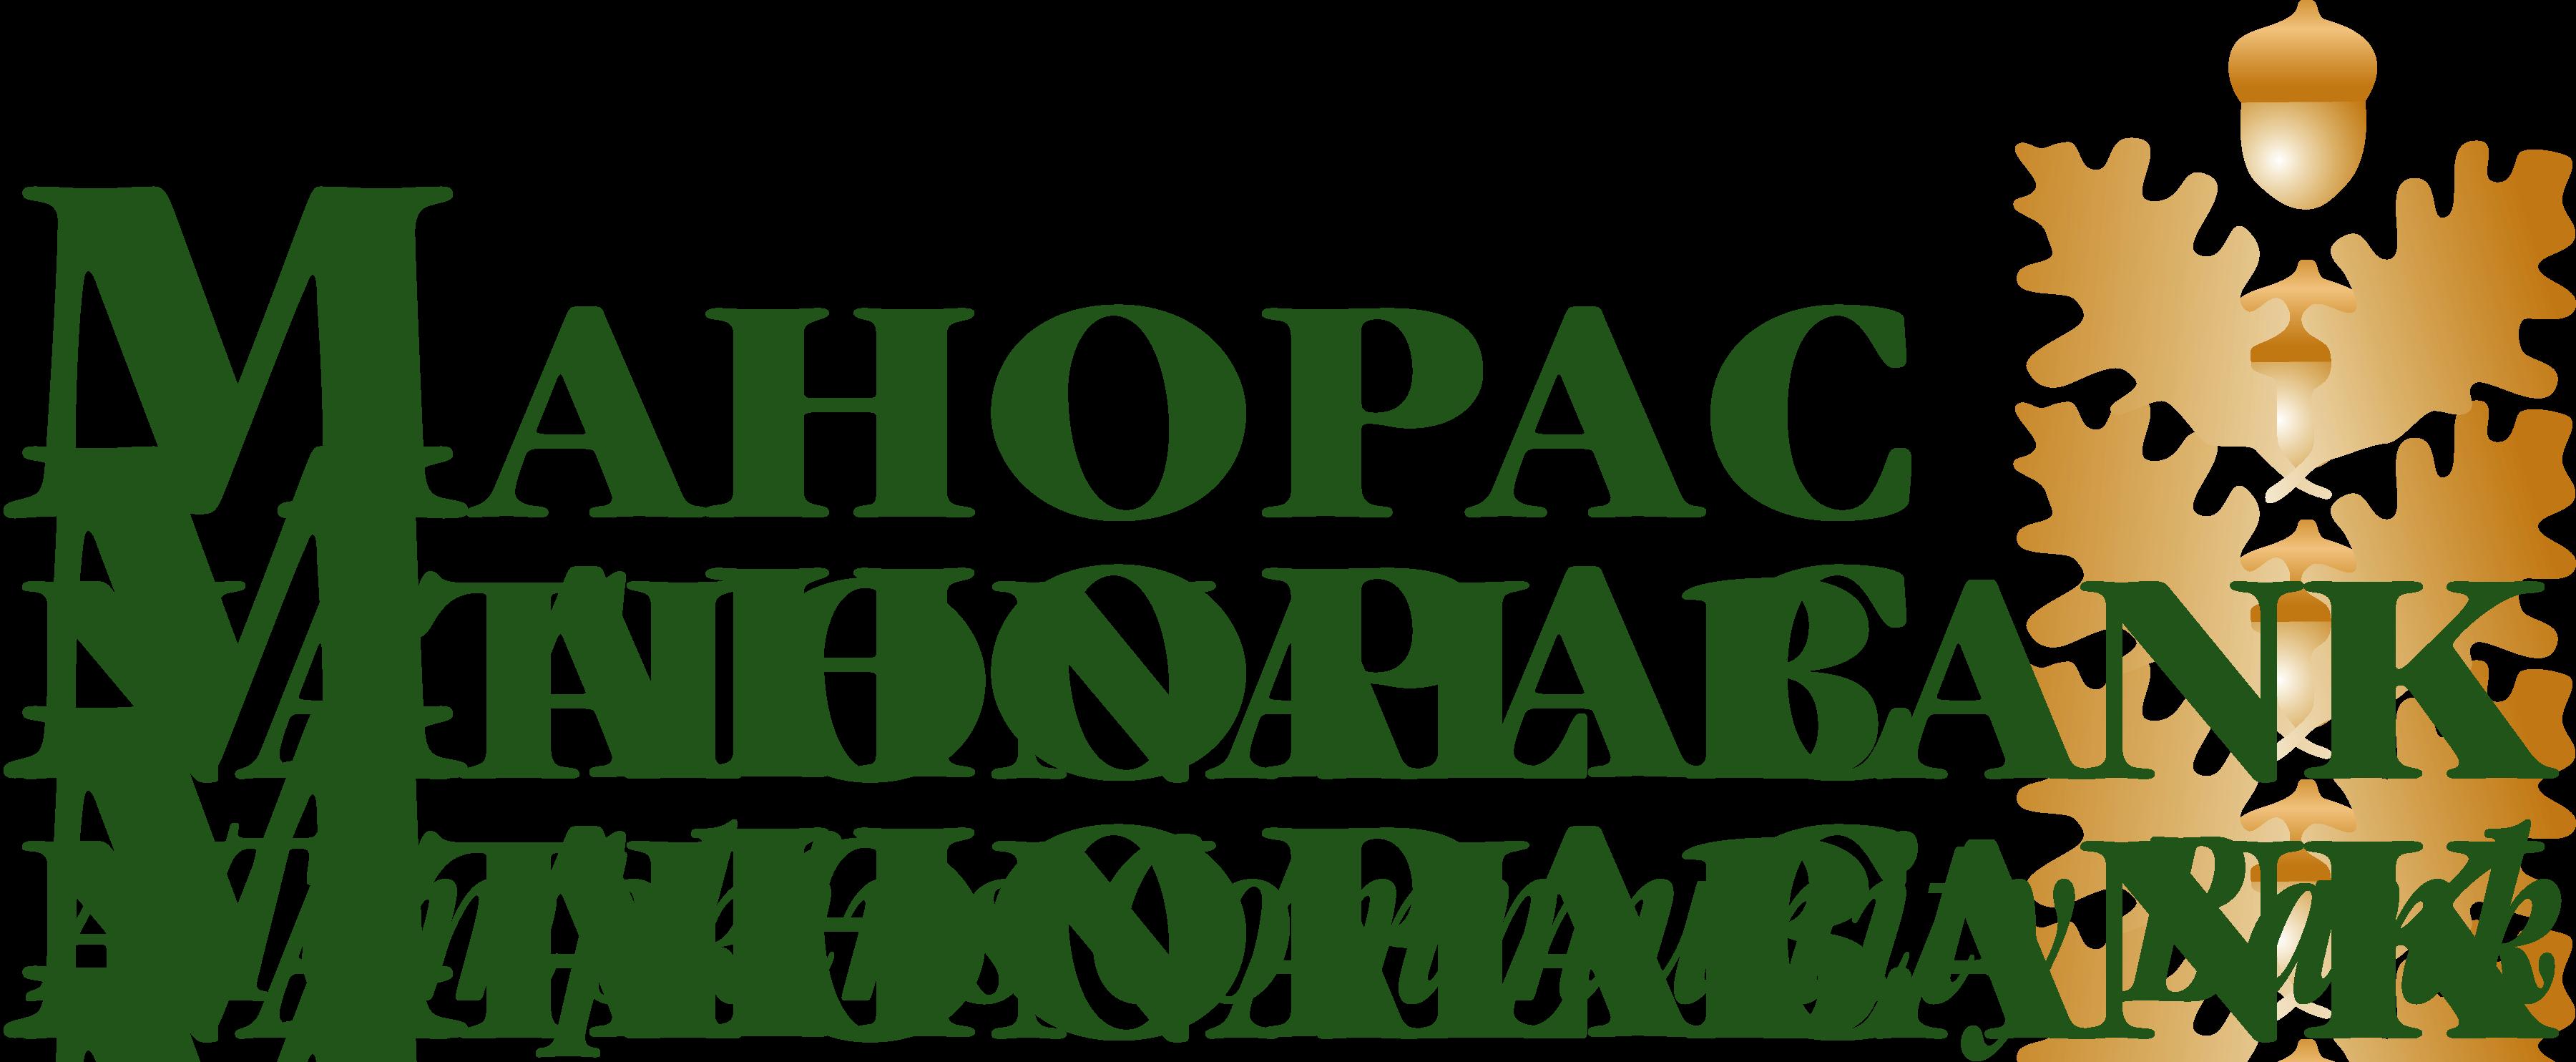 Community Service - Mahopac National Bank